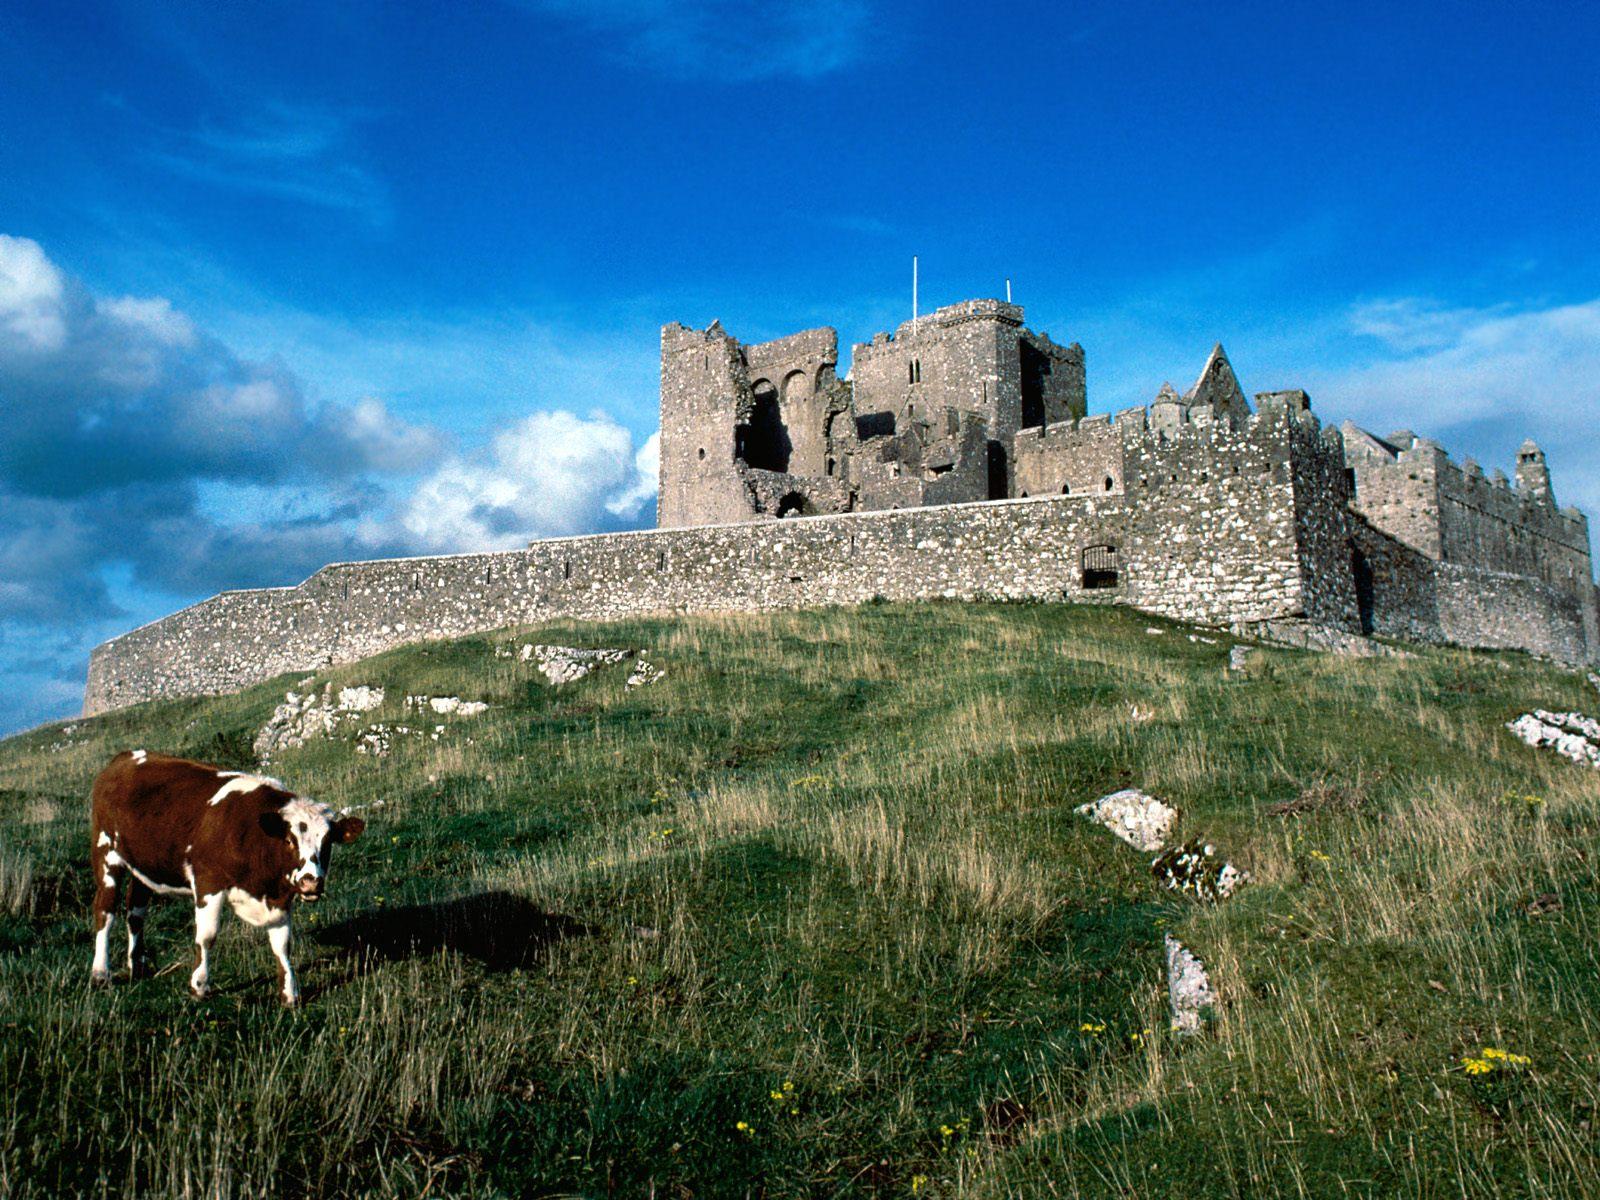 http://4.bp.blogspot.com/_0EZs4bjf09Y/S9qudZGmmMI/AAAAAAAAN9M/x_JRfOOiXwQ/S1600-R/Cashel+Castle,+Ireland.jpg